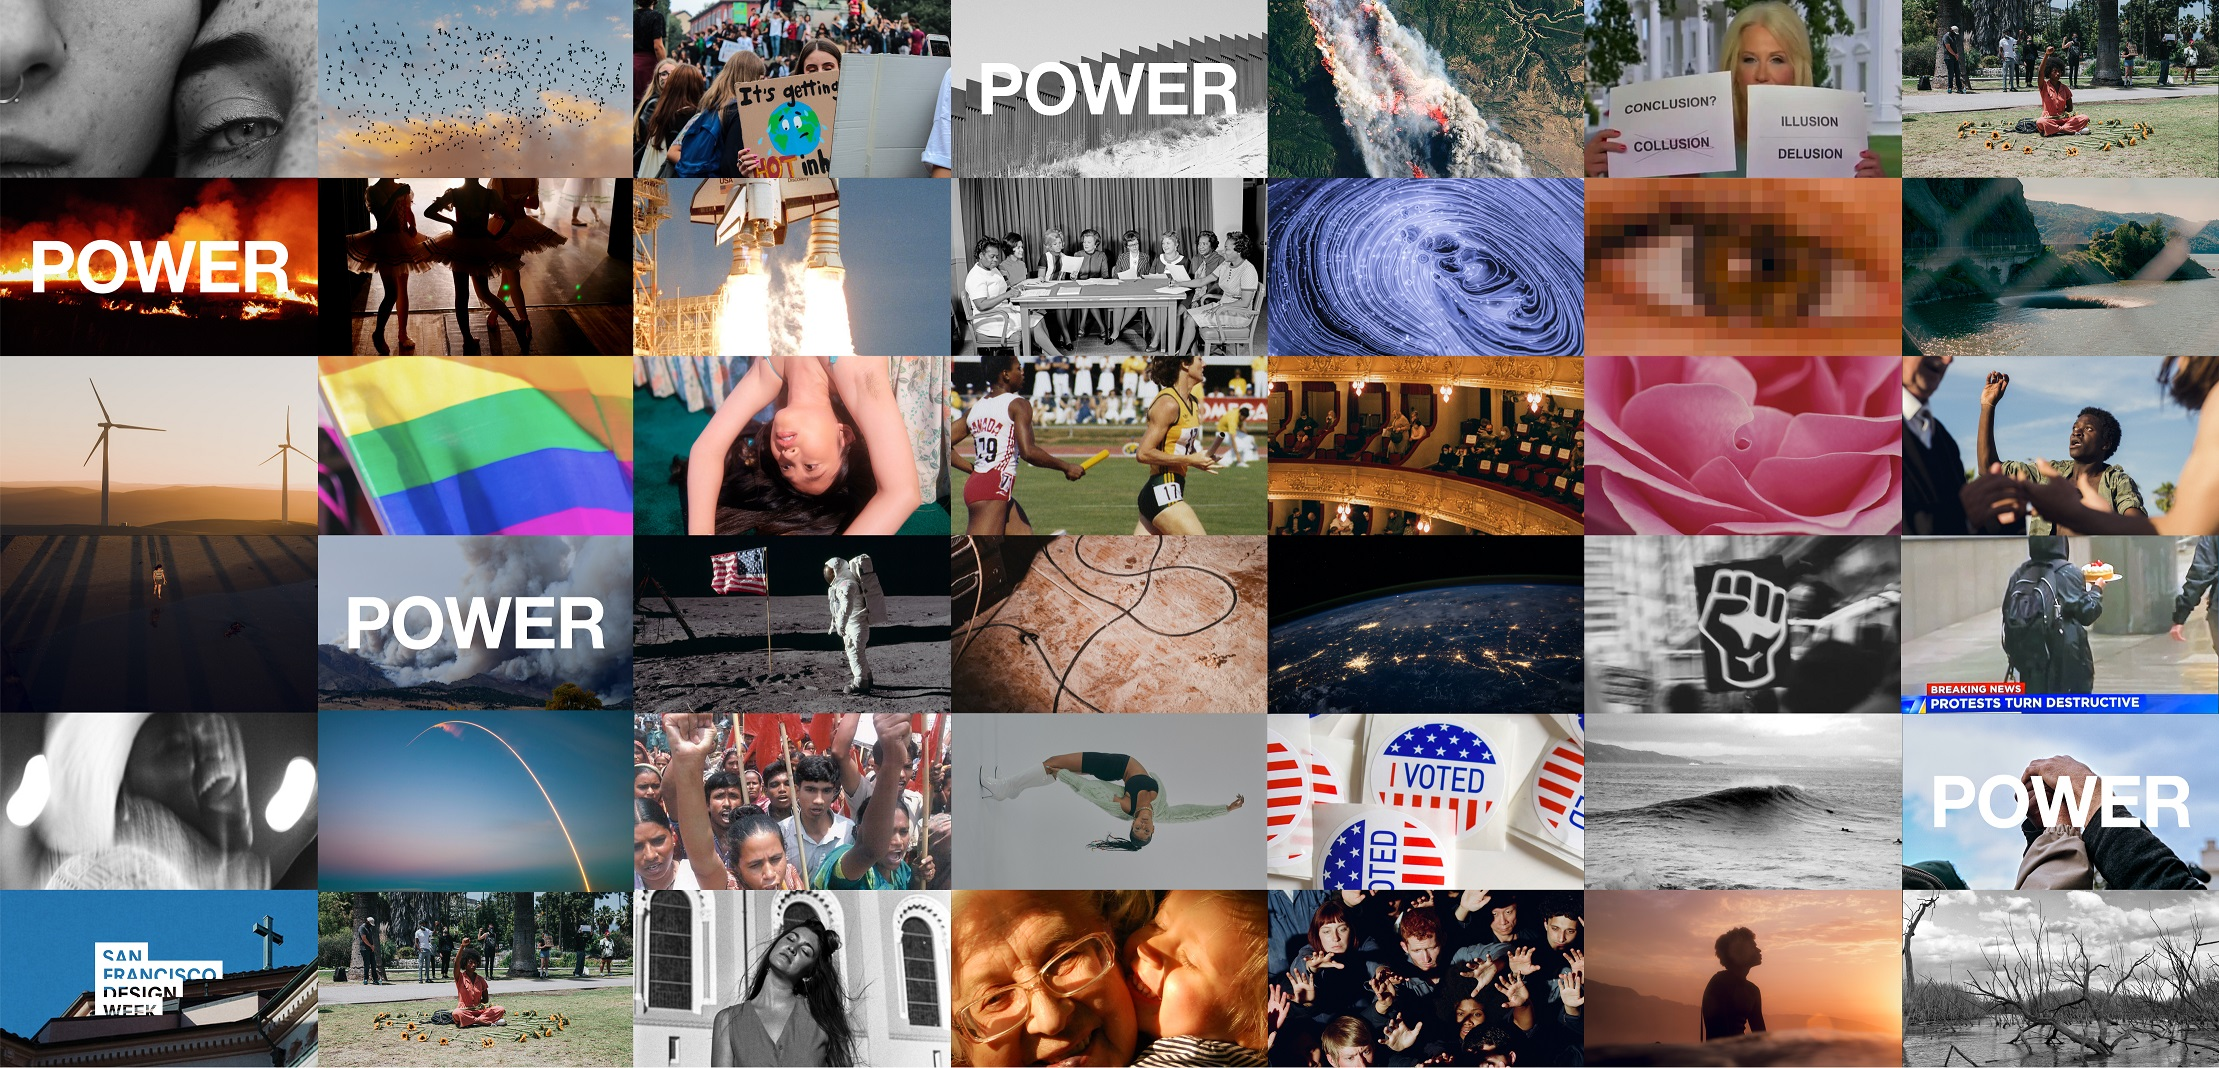 Landscape Creates 'Power' Identity for San Francisco Design Week